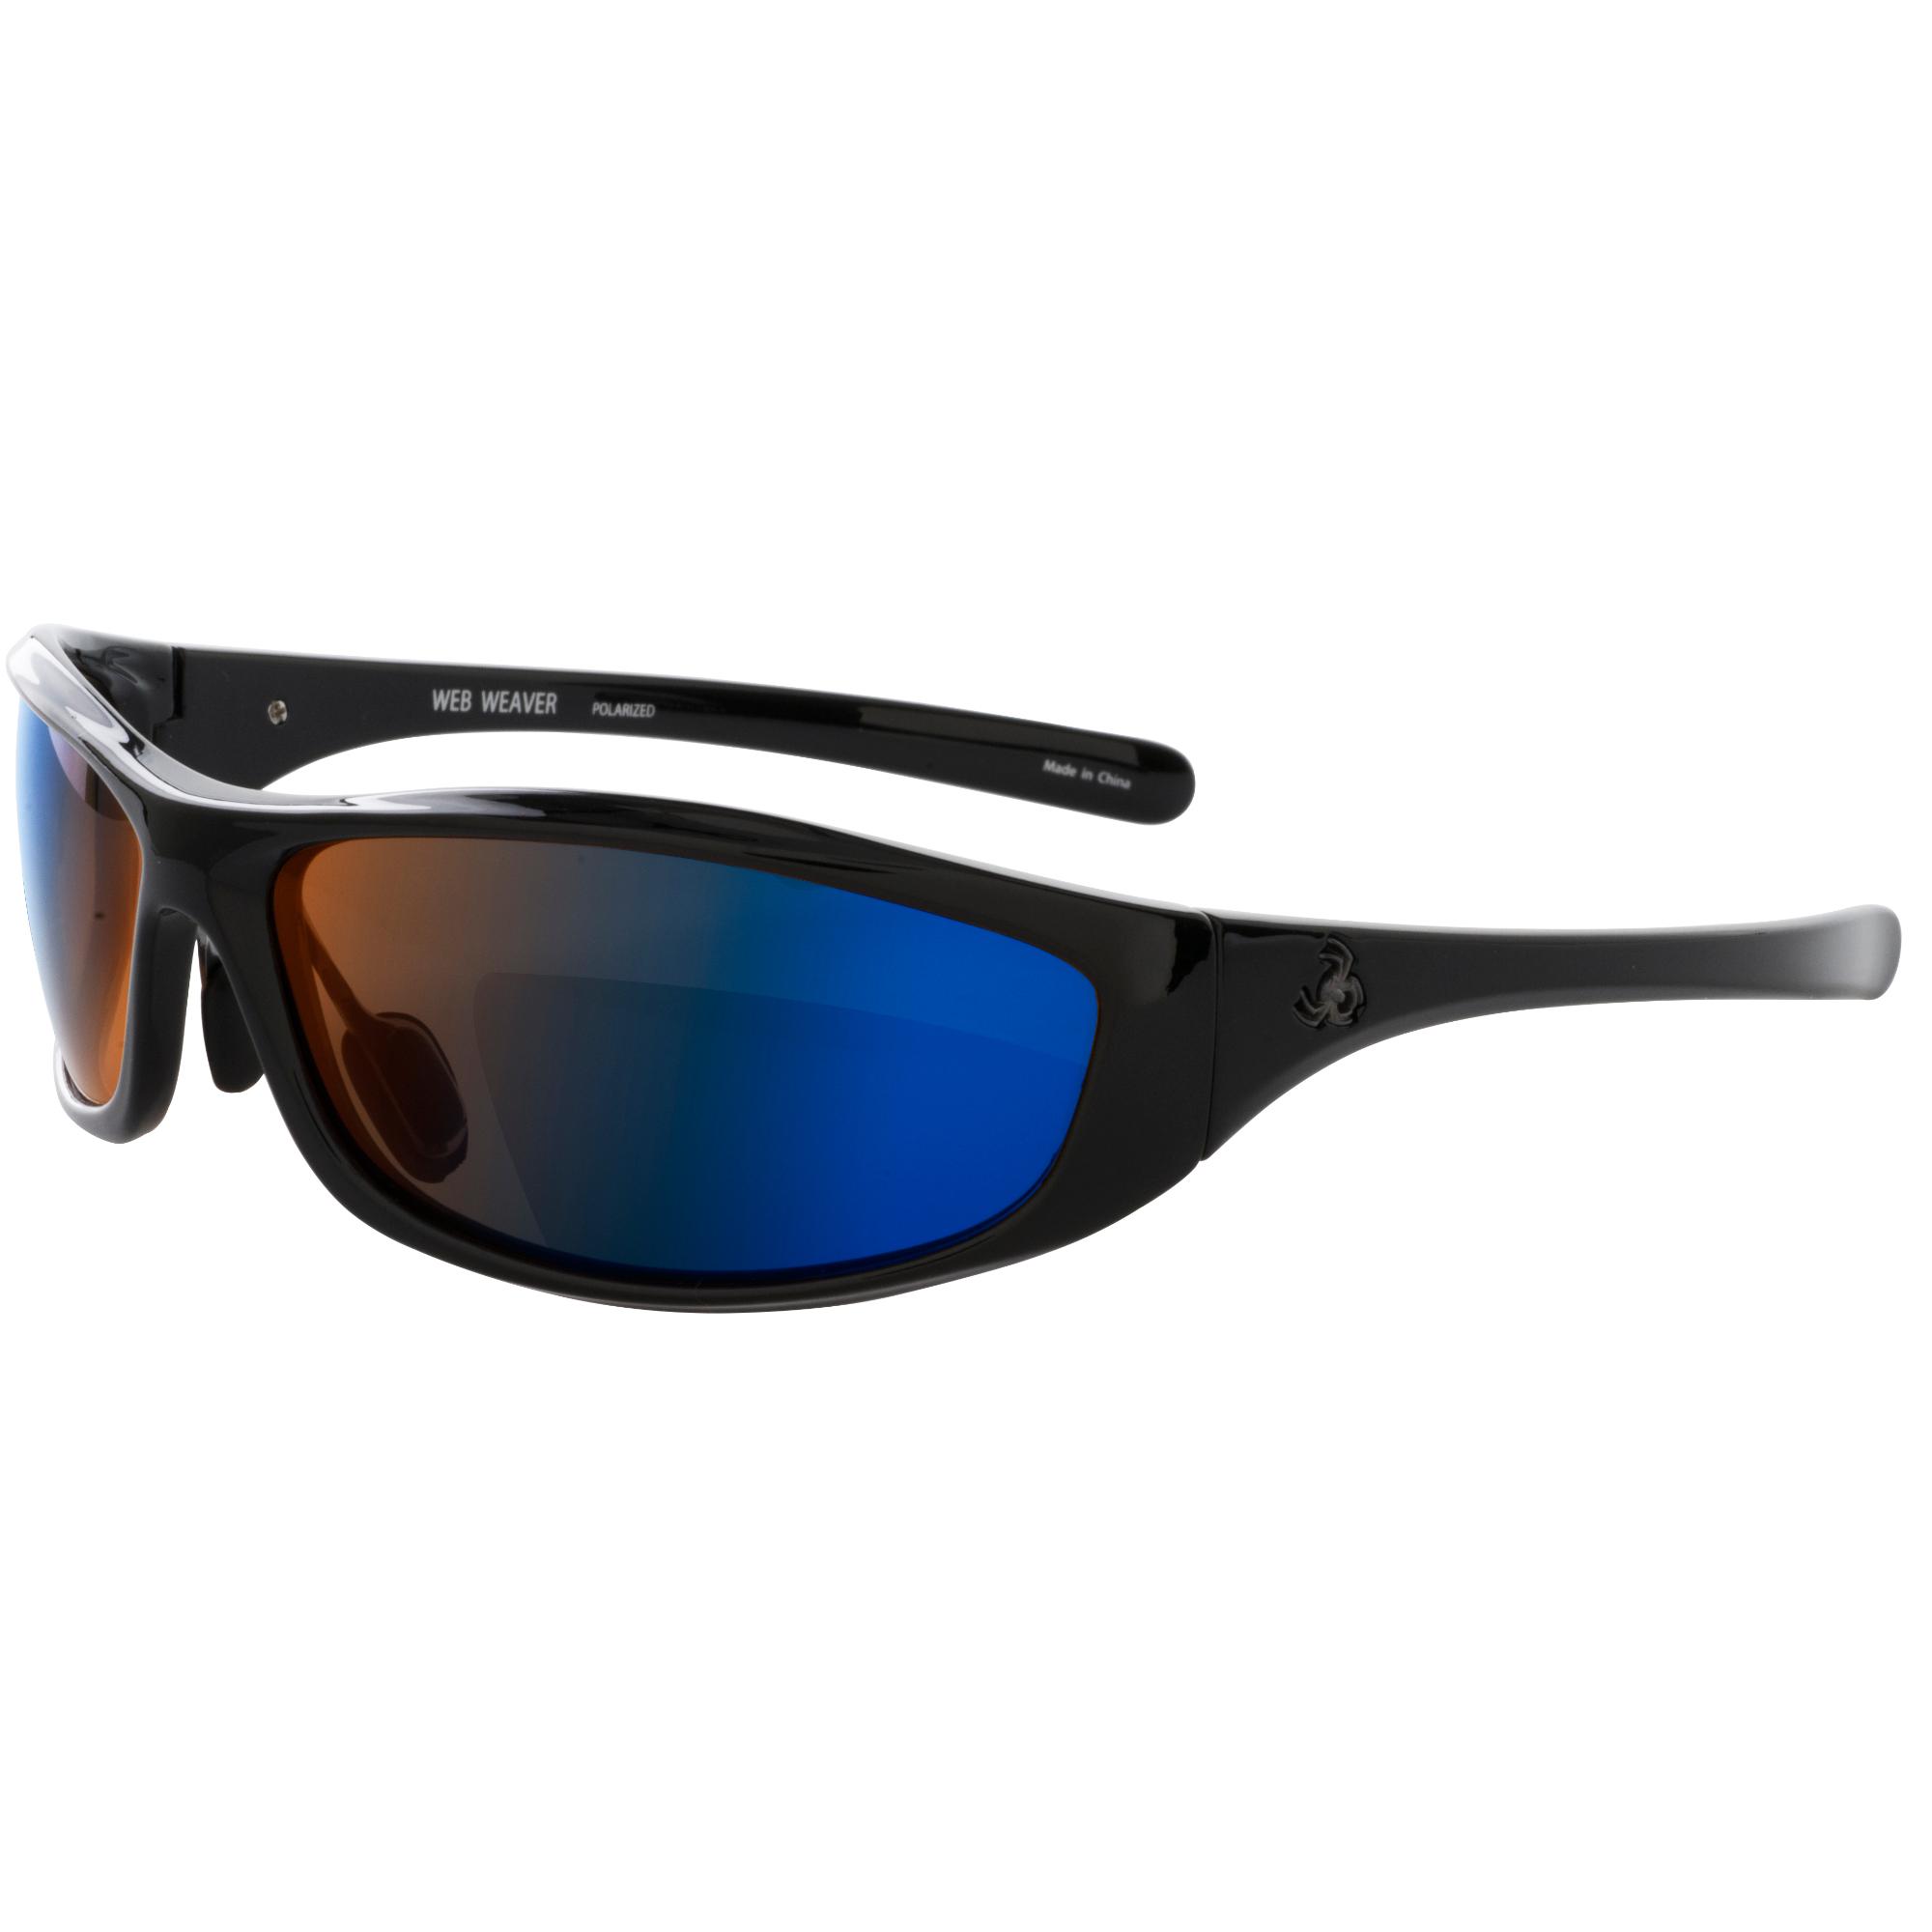 Spiderwire polarized sunglasses louisiana bucket brigade for Polarized fishing sunglasses walmart